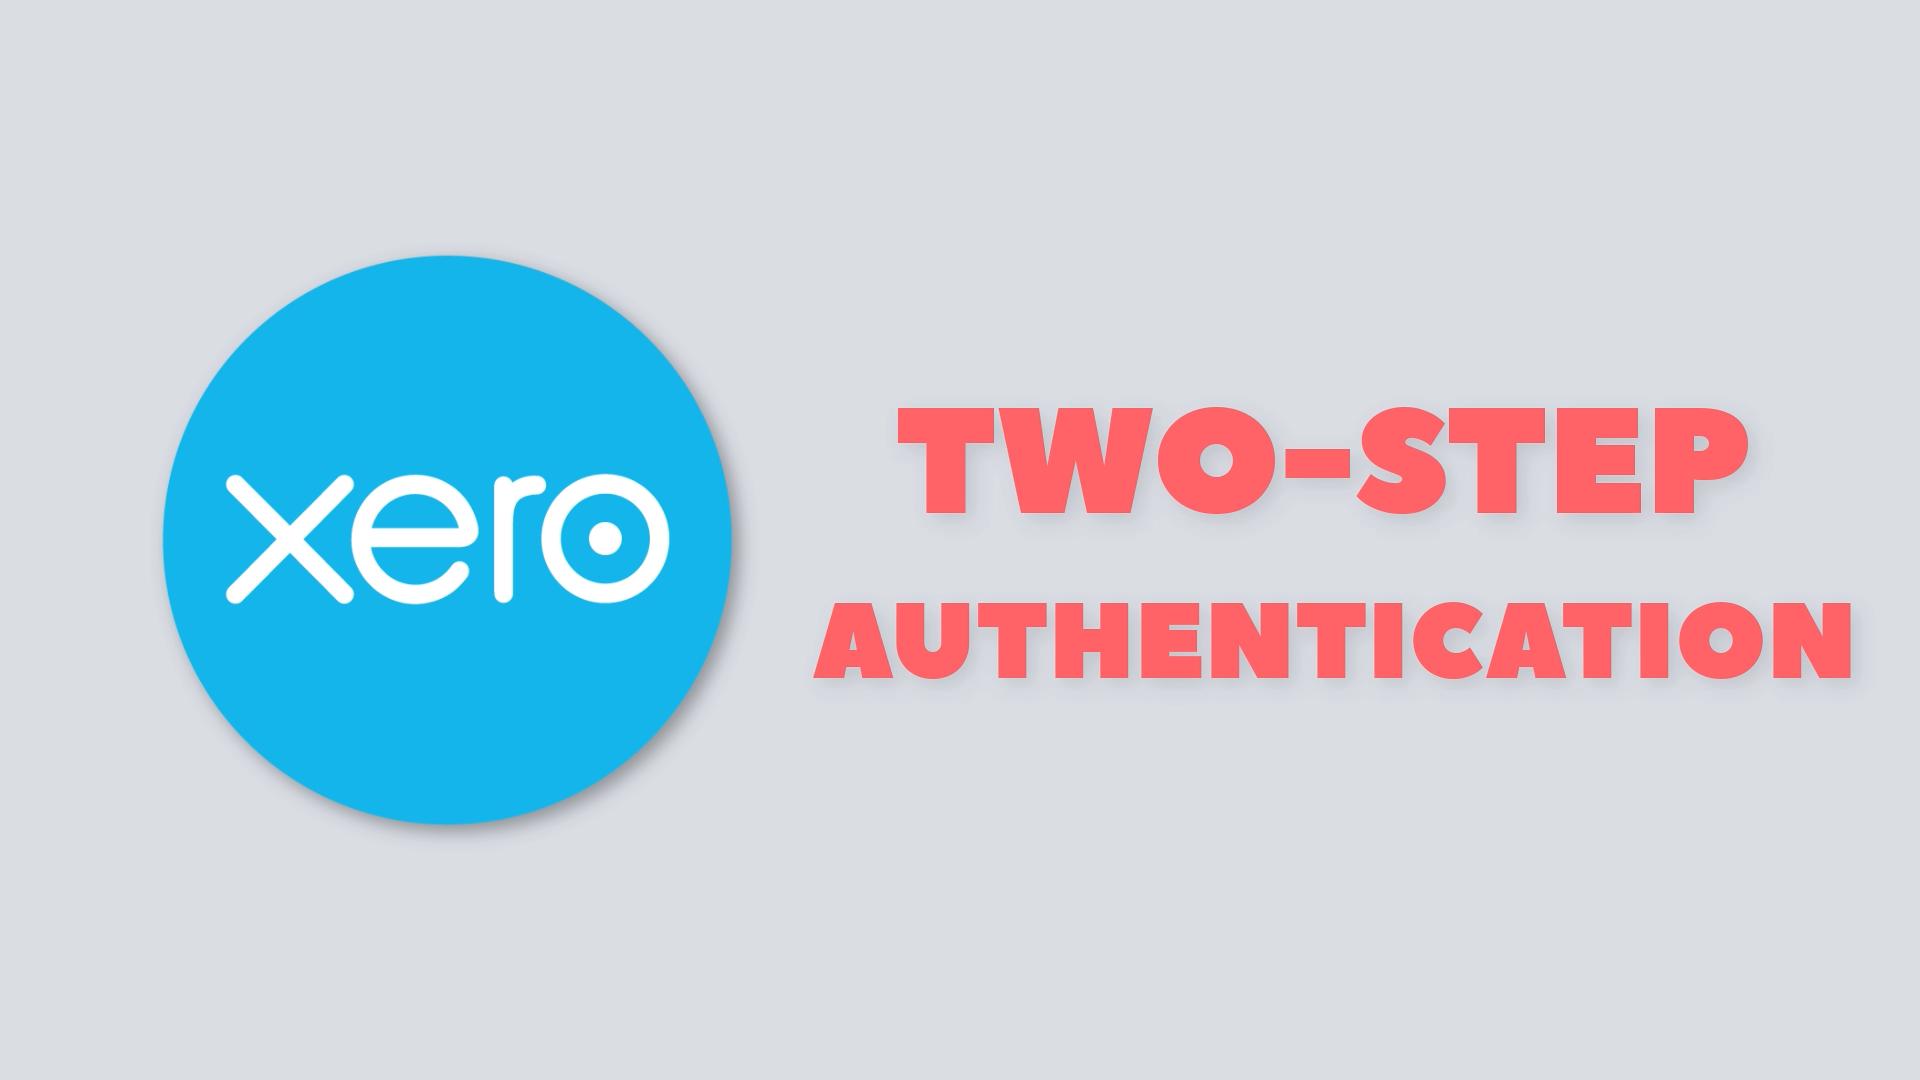 Xero Two-Step Authentication